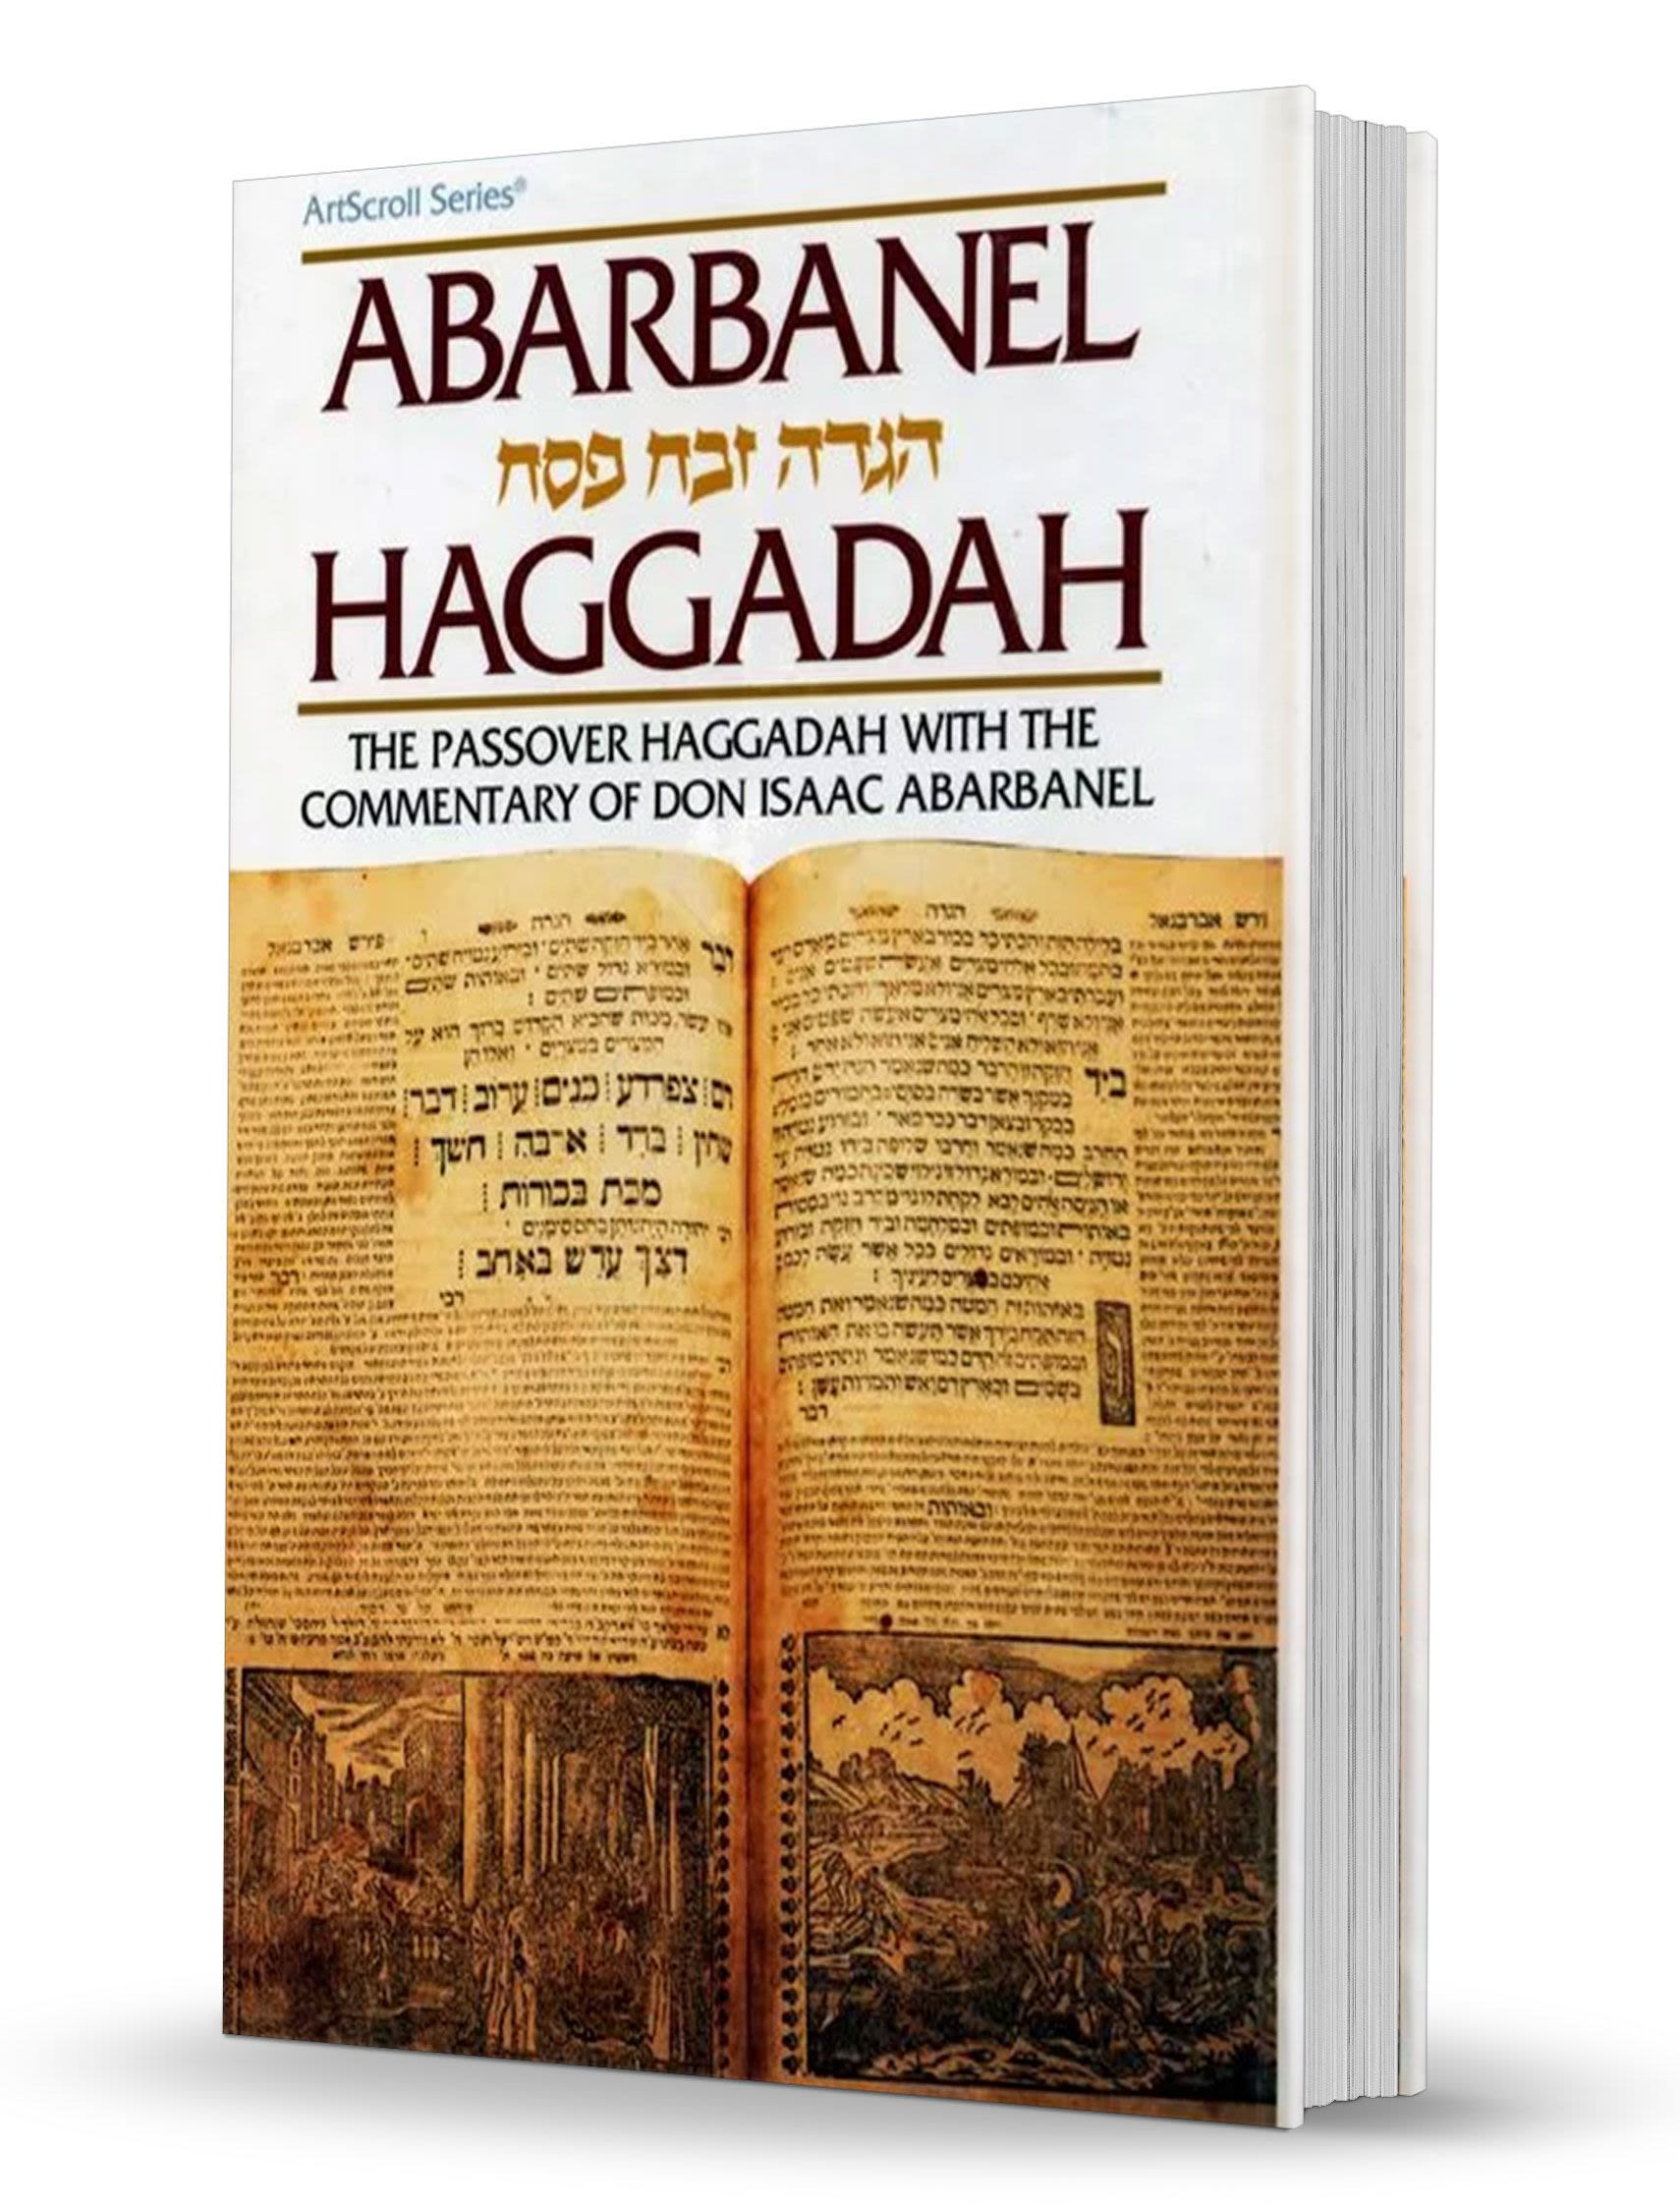 The Abarbanel Haggadah